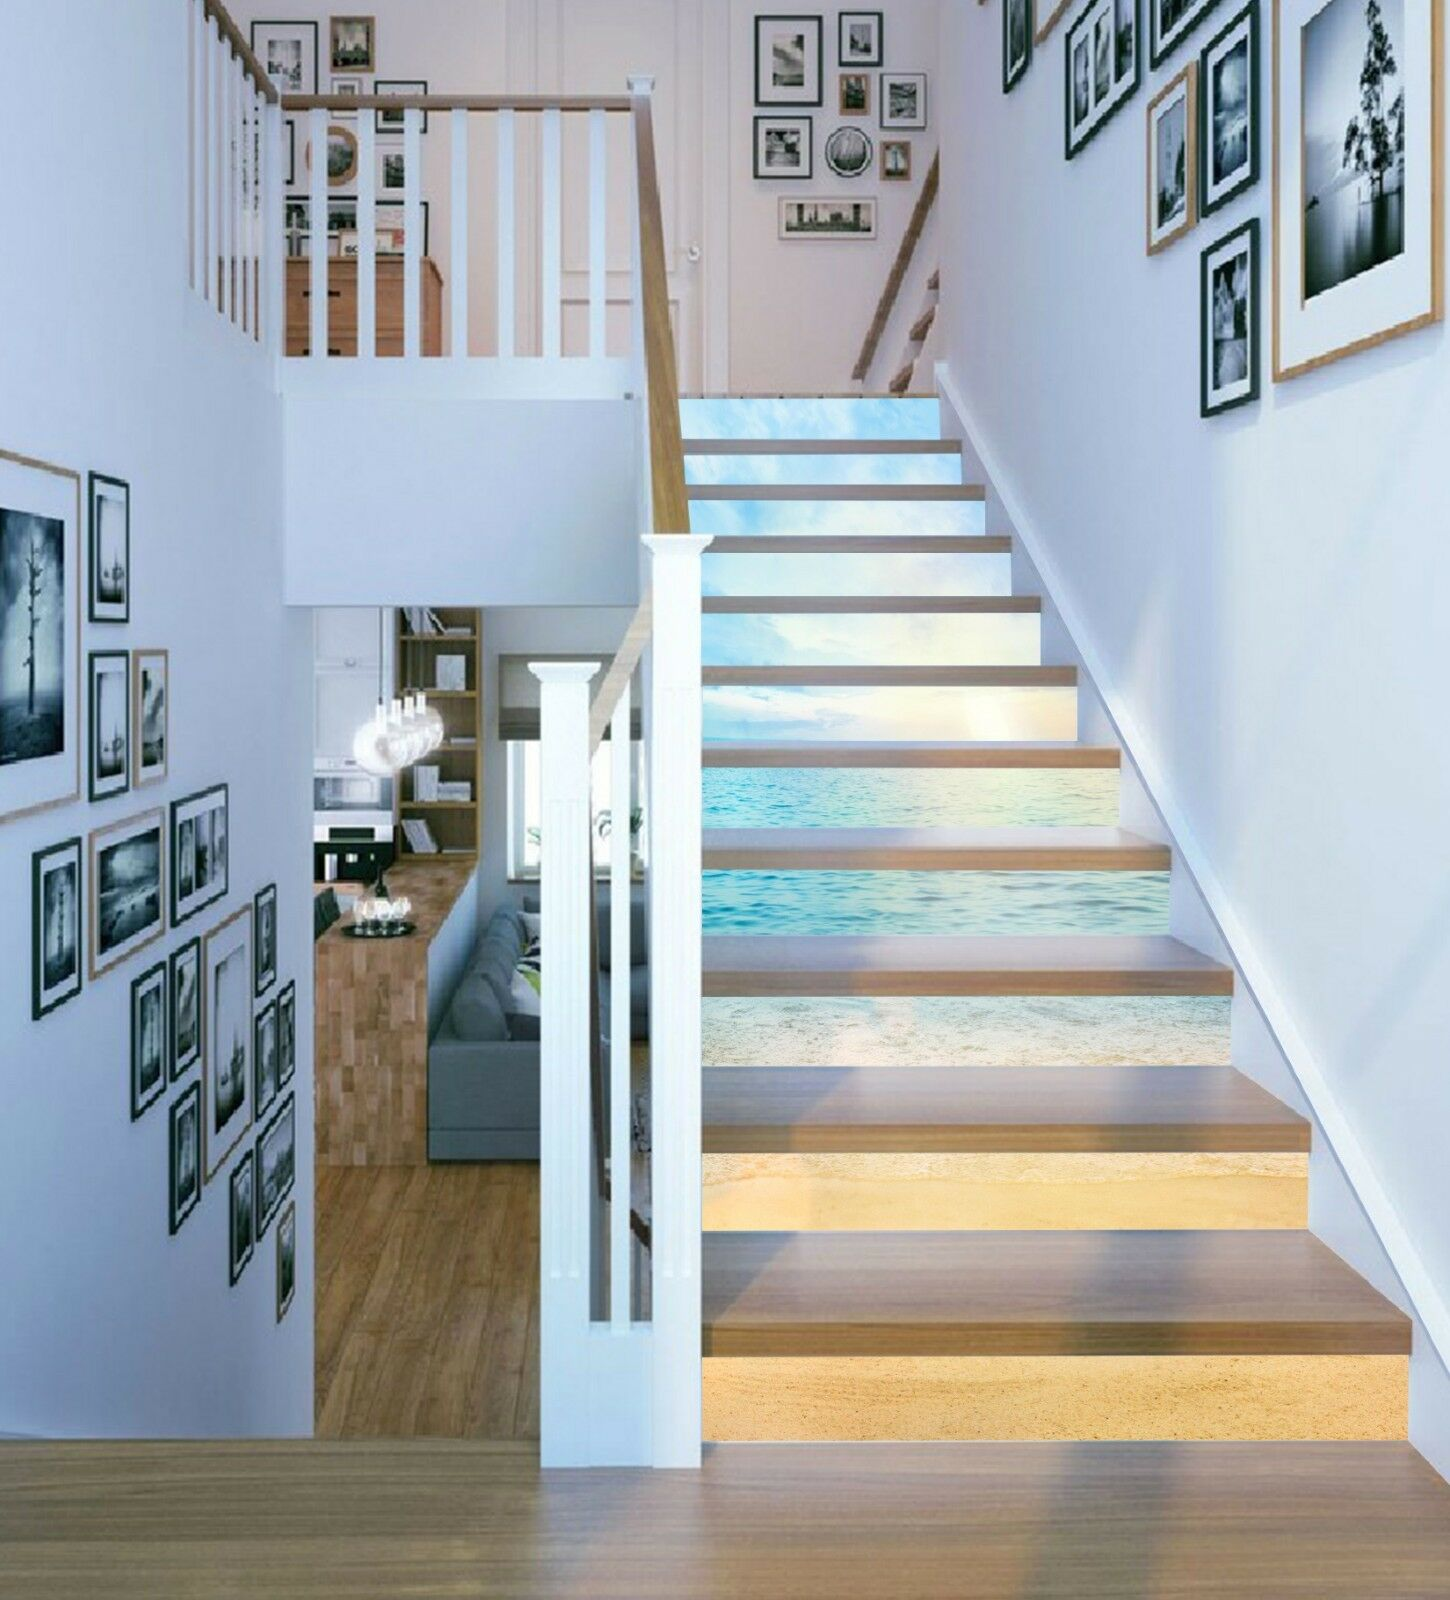 3D Helles Meer 1301 Stair Risers Dekoration Fototapete Vinyl Aufkleber Tapete DE